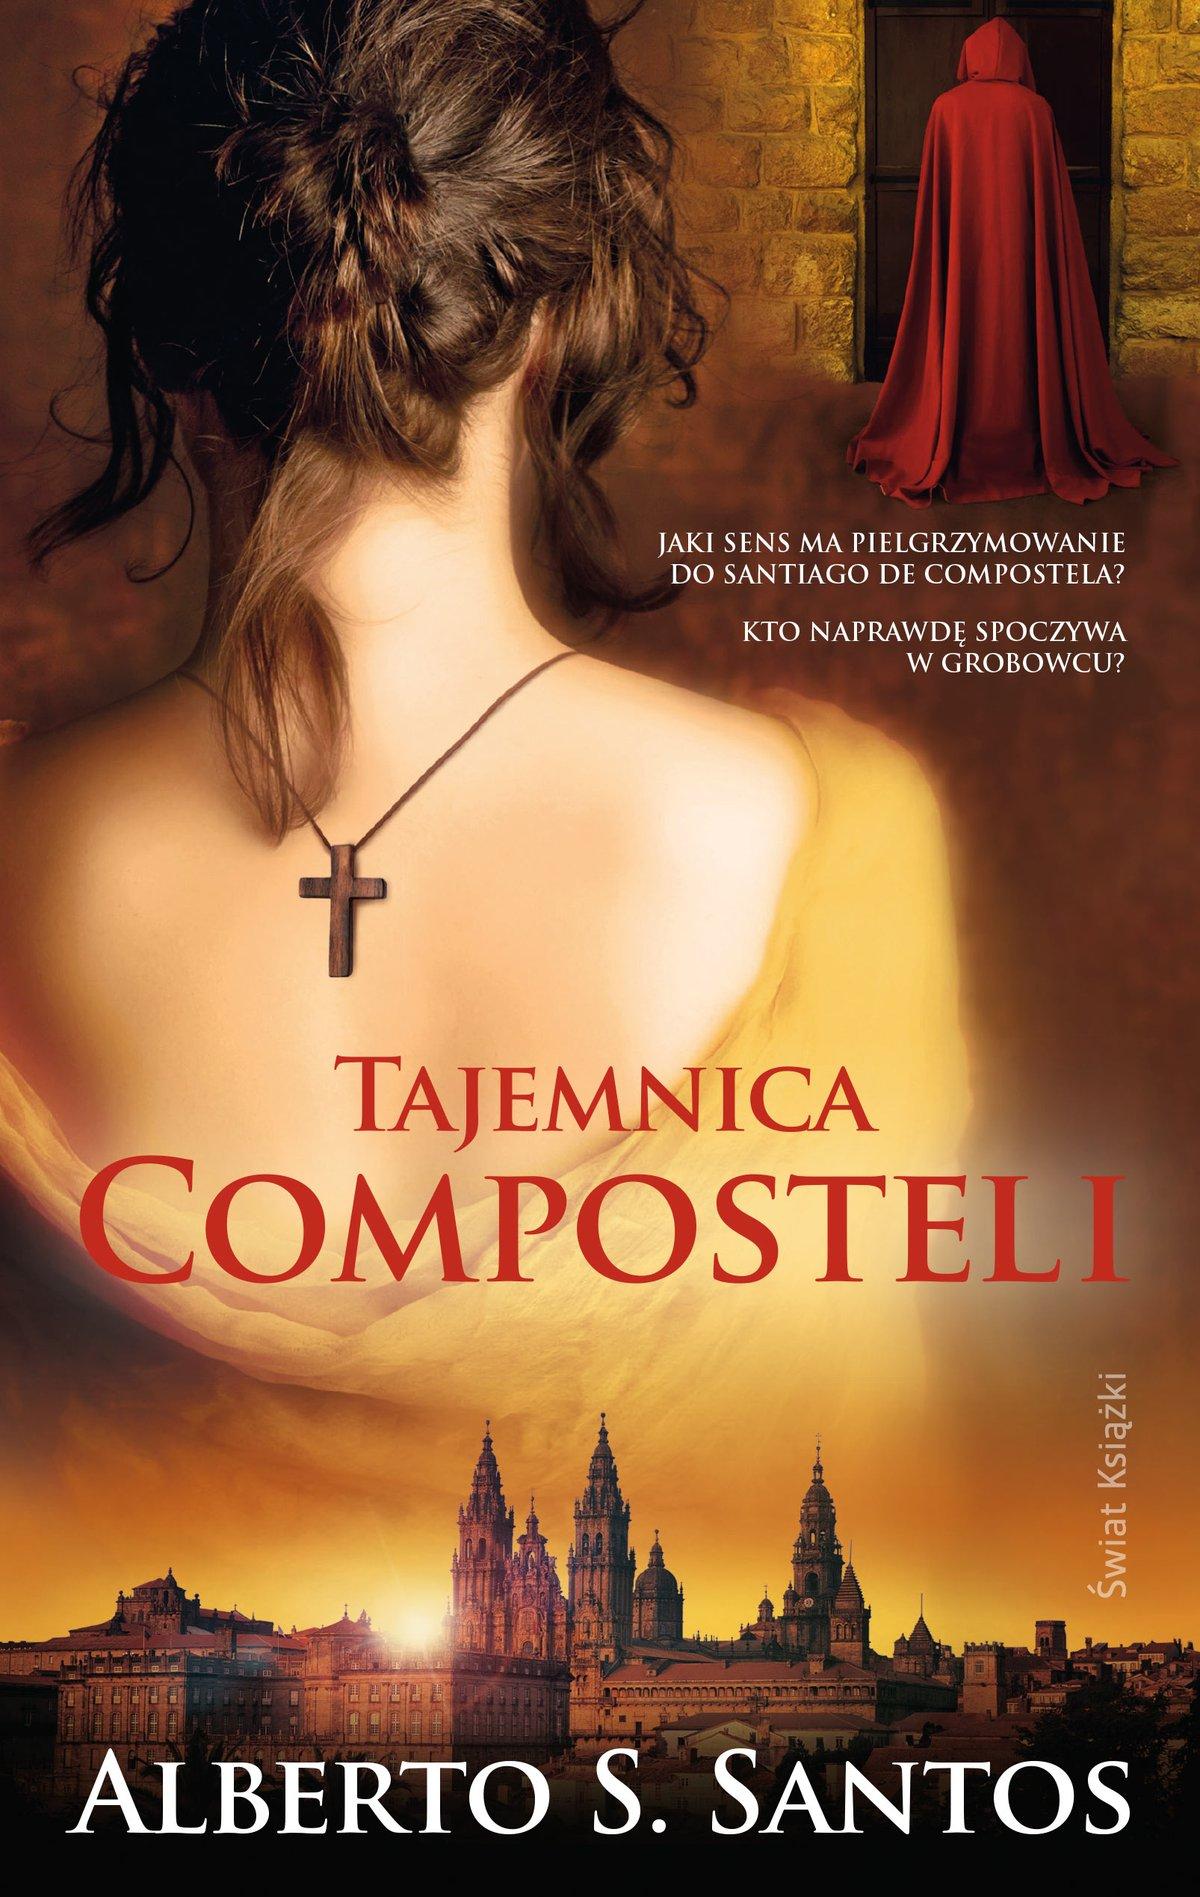 Tajemnica Composteli - Ebook (Książka na Kindle) do pobrania w formacie MOBI